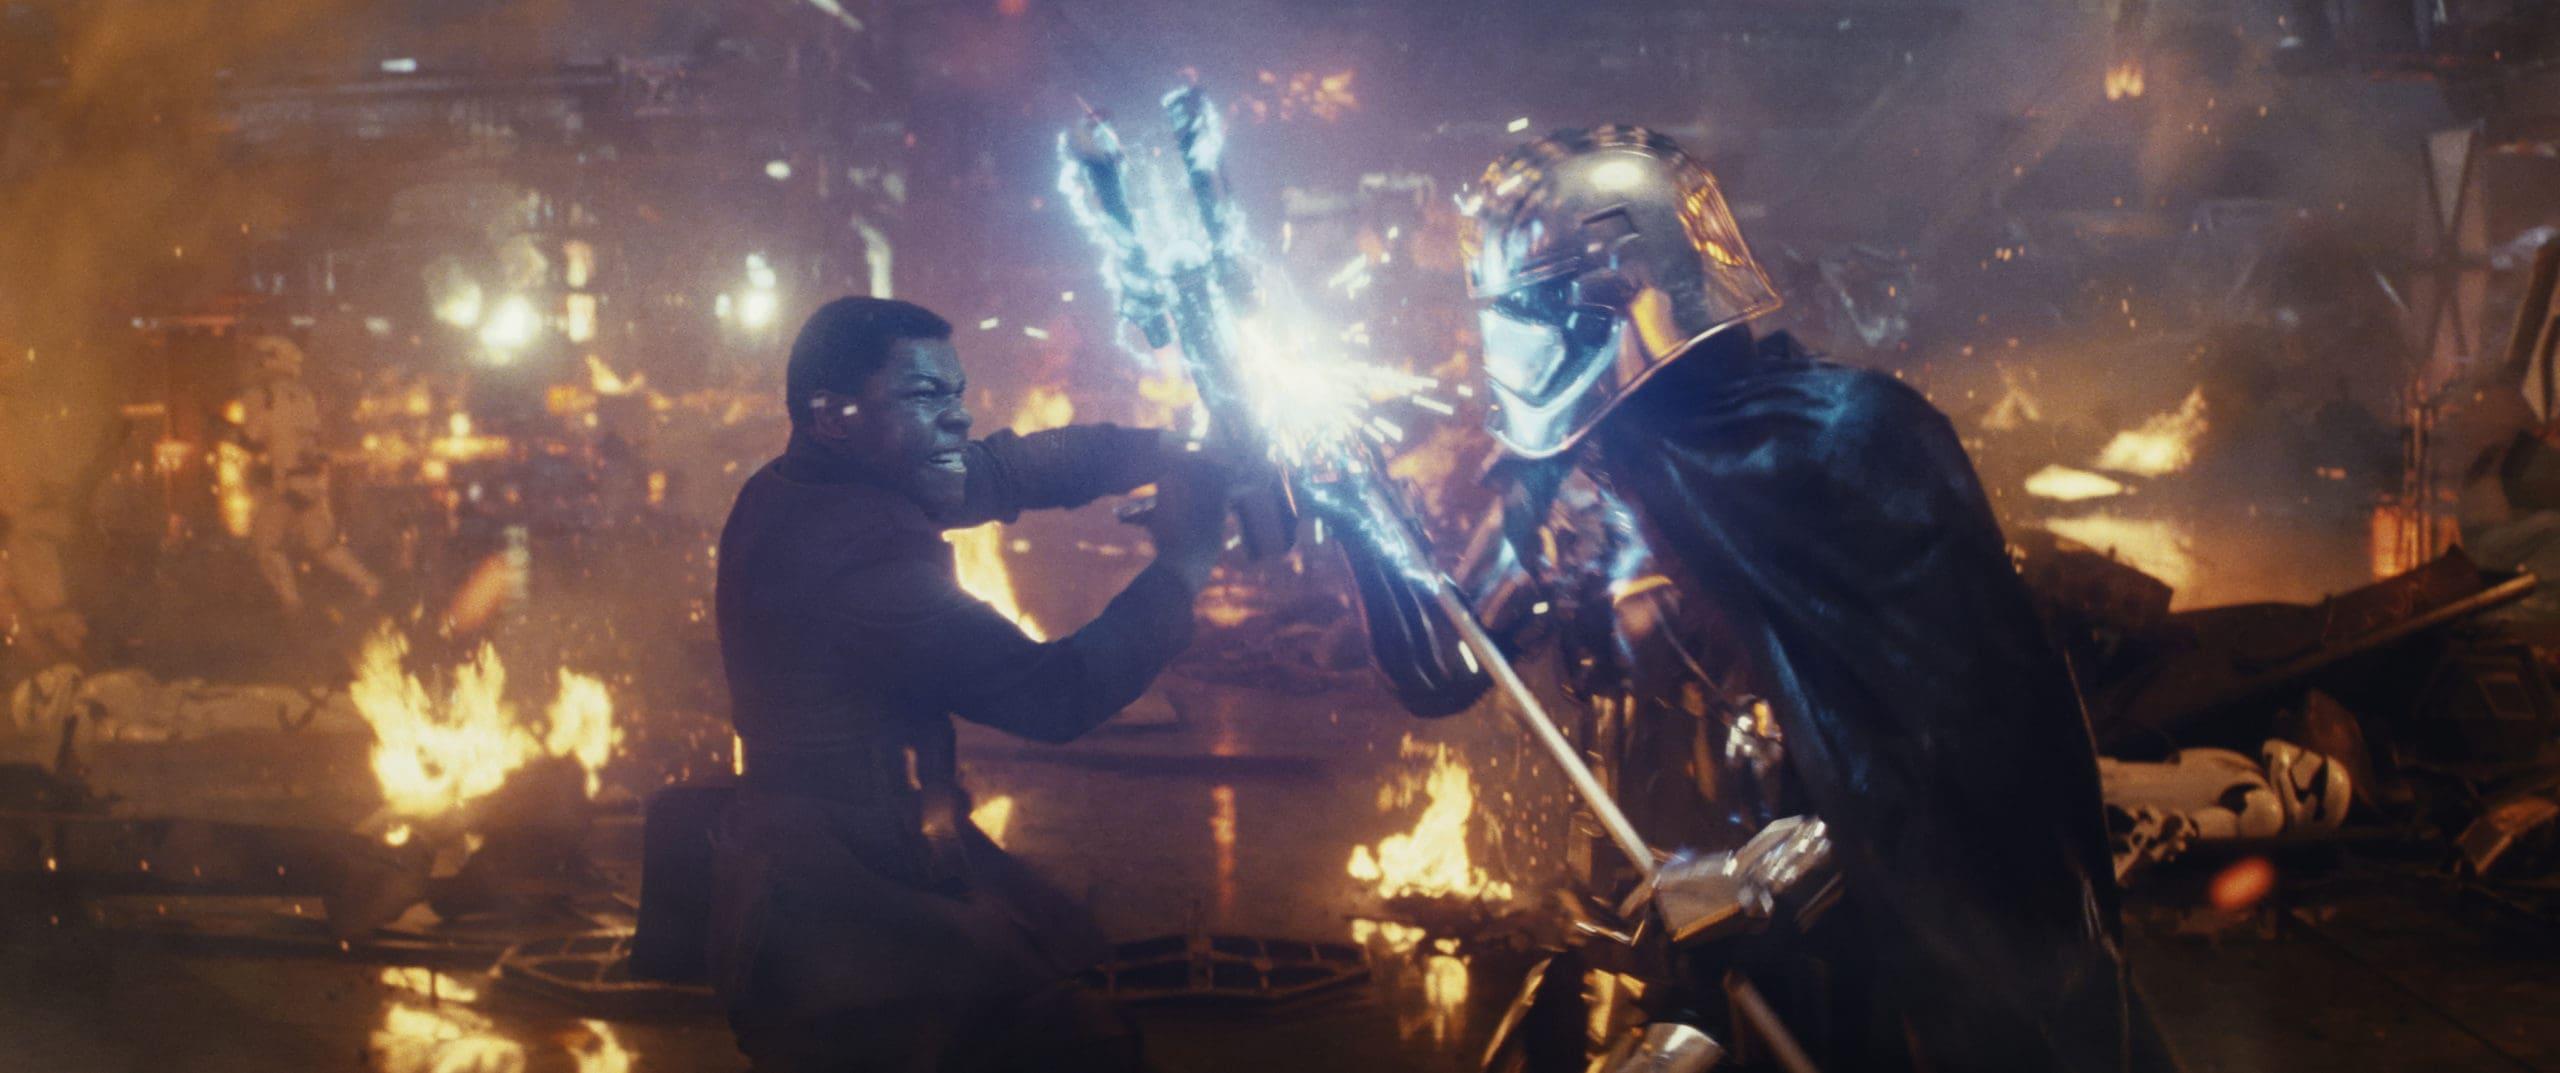 Star Wars: The Last Jedi..L to R: Finn (John Boyega) battling Captain Phasma (Gwendoline Christie)..Photo: Lucasfilm Ltd. ..© 2017 Lucasfilm Ltd. All Rights Reserved.